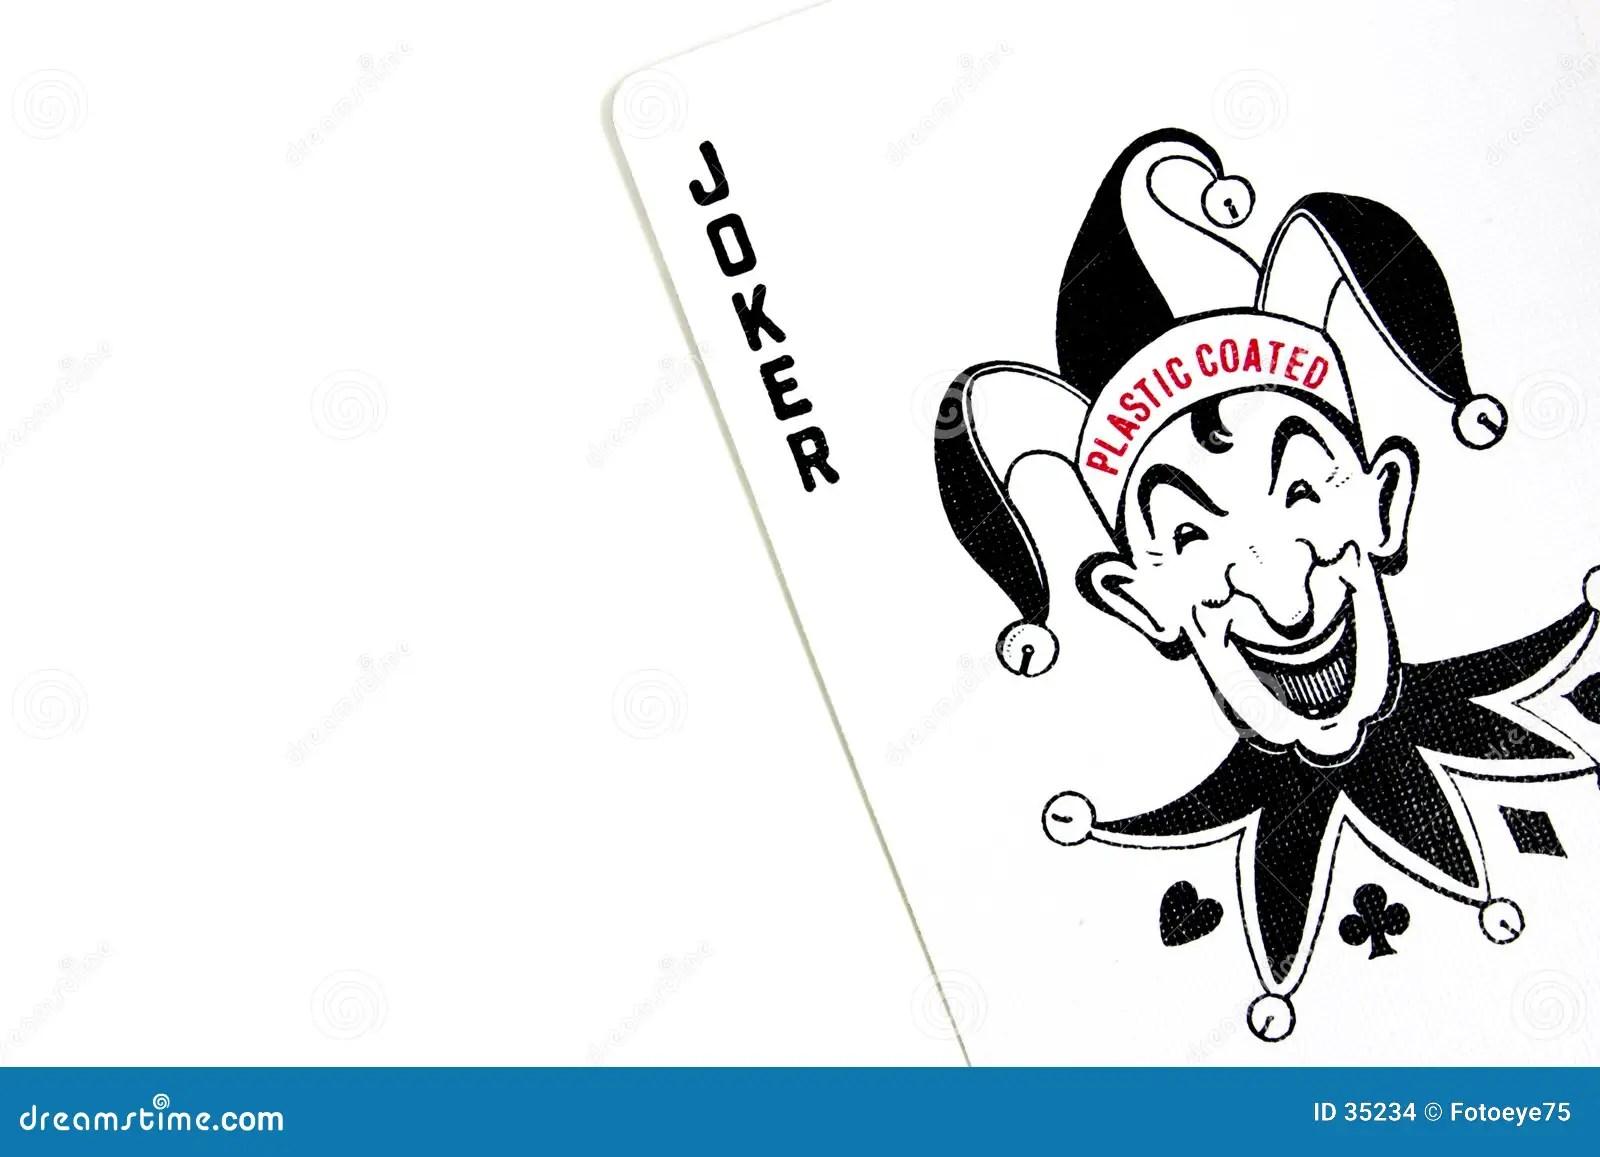 Joker Playing Card Vector